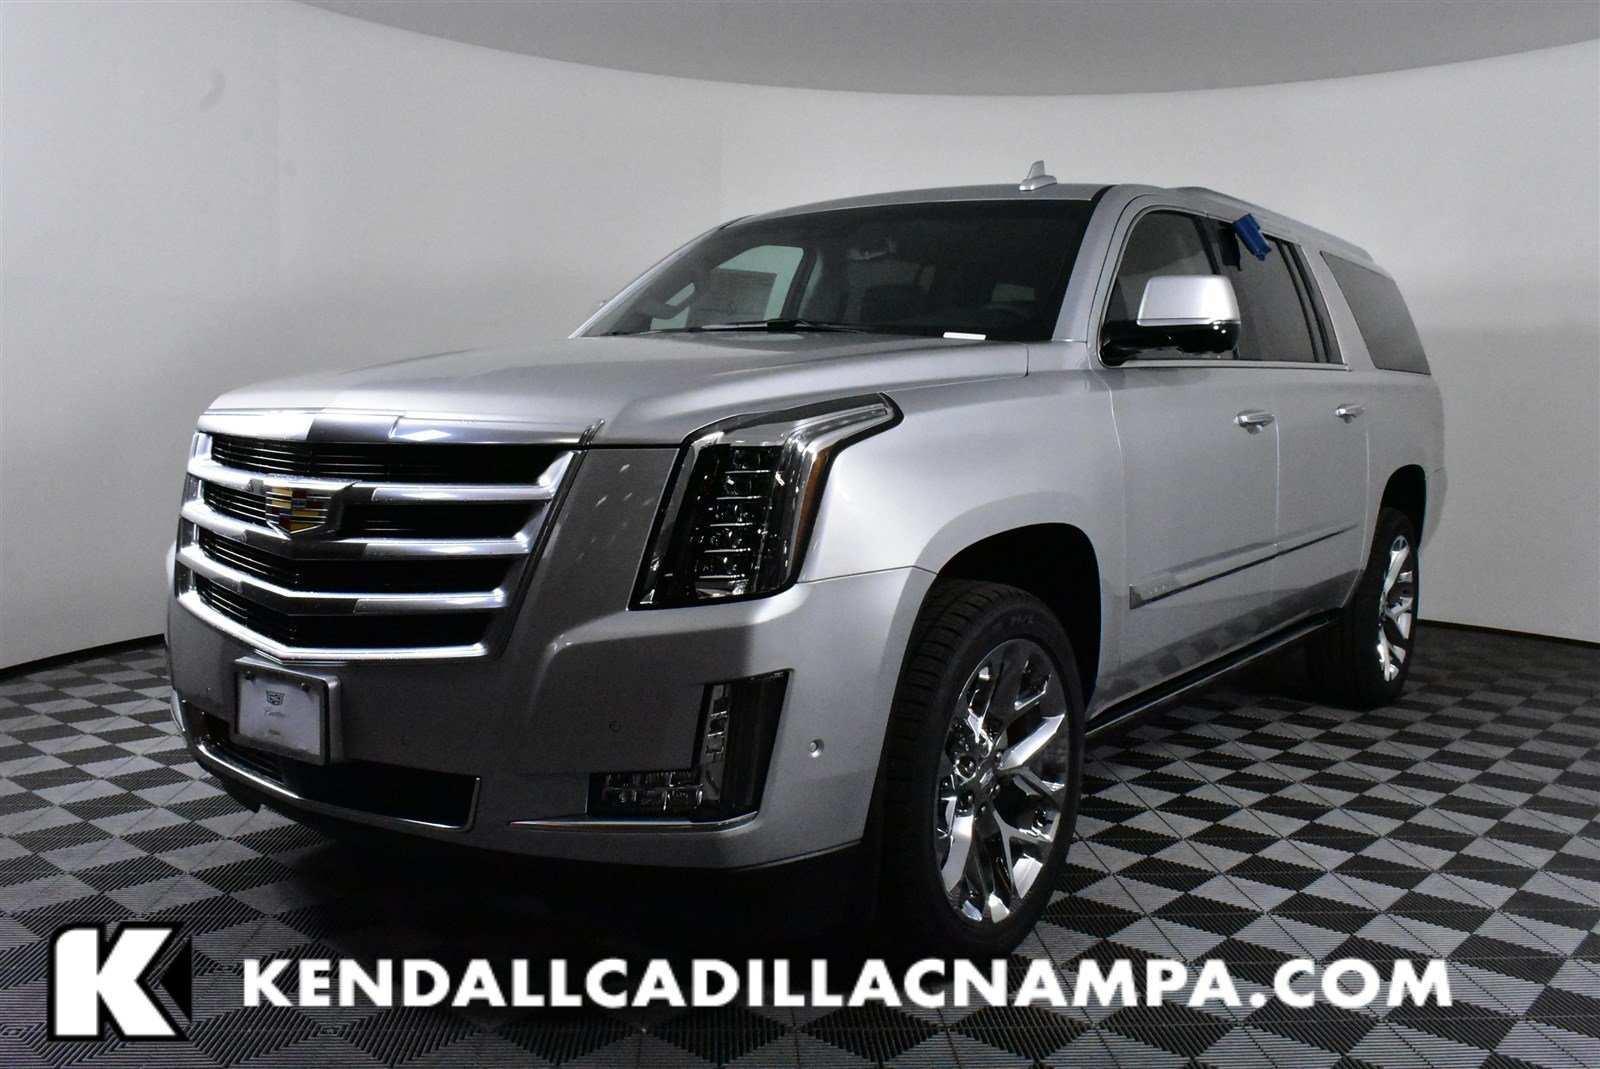 71 Concept of 2019 Cadillac Esv Release for 2019 Cadillac Esv